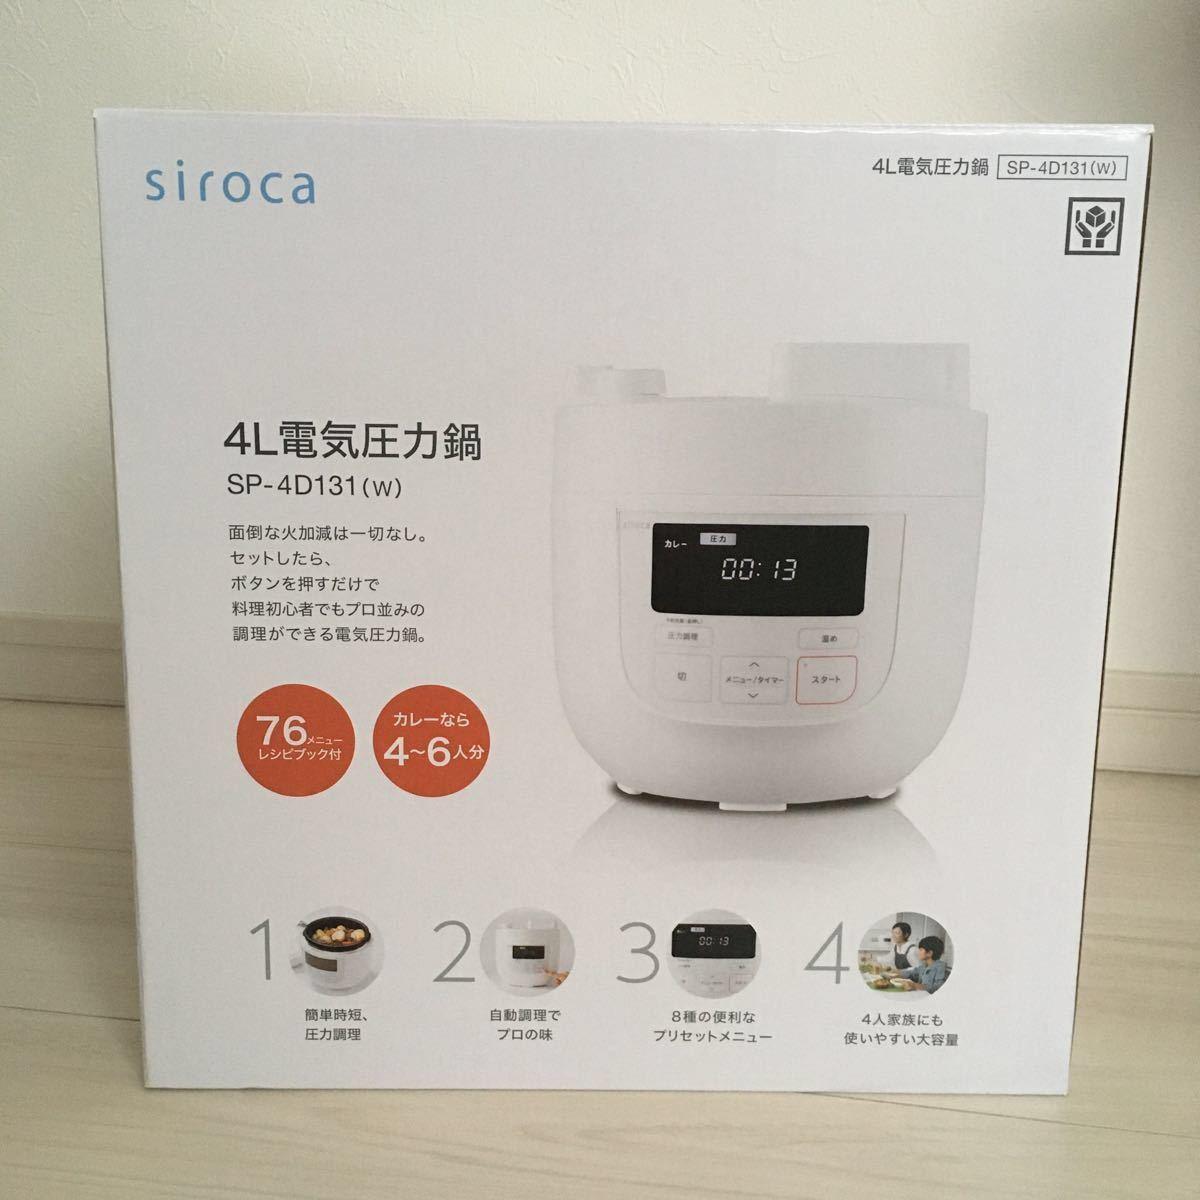 siroca SP-4D131 シロカ 電気圧力鍋 4L ホワイト 新品 未使用品 送料無料